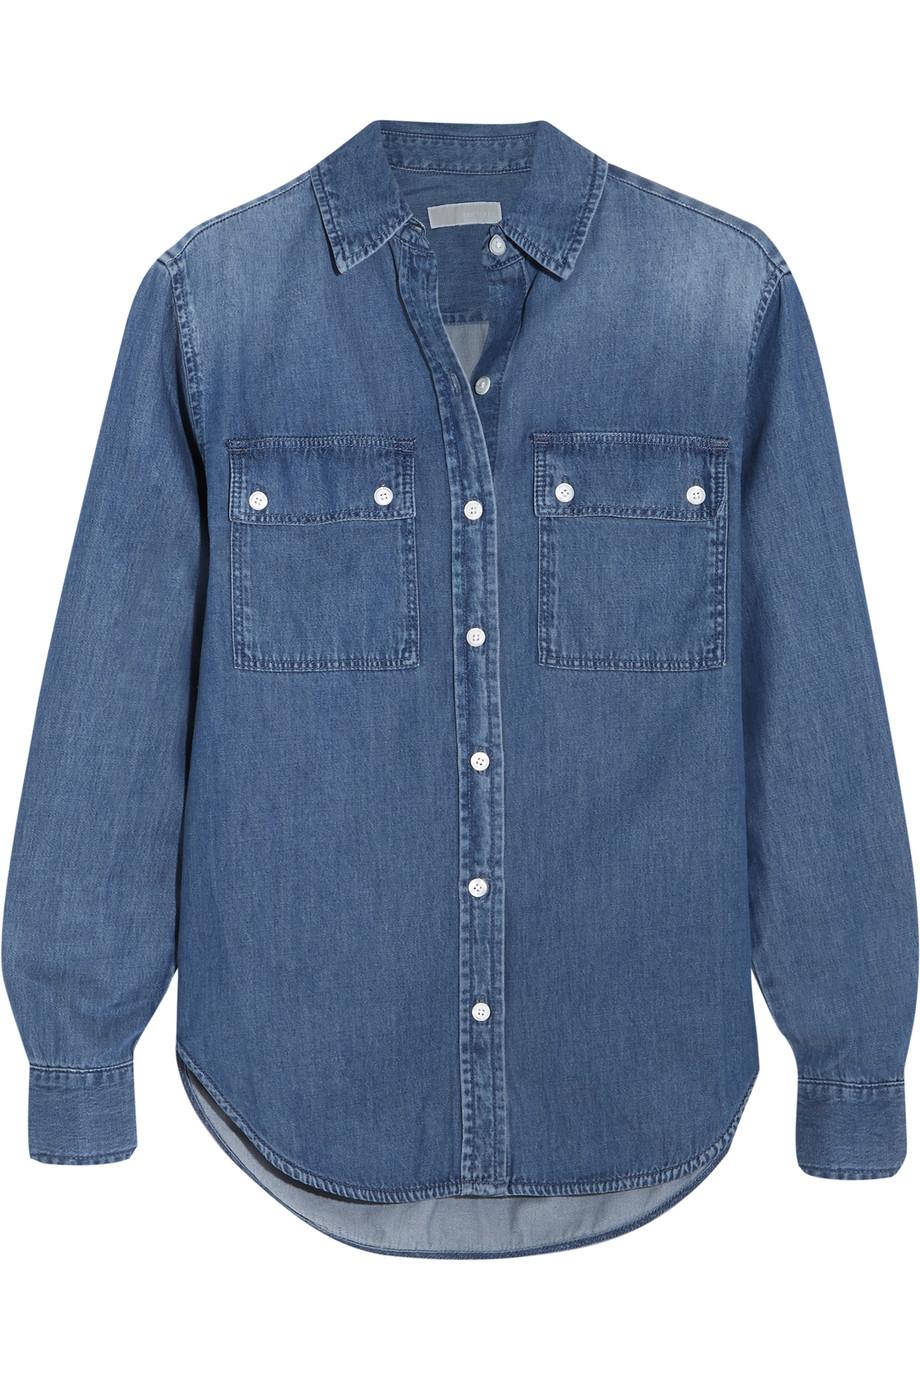 Camp Denim Shirt, Michael Michael Kors, Dark Denim, Women's, Size: XS